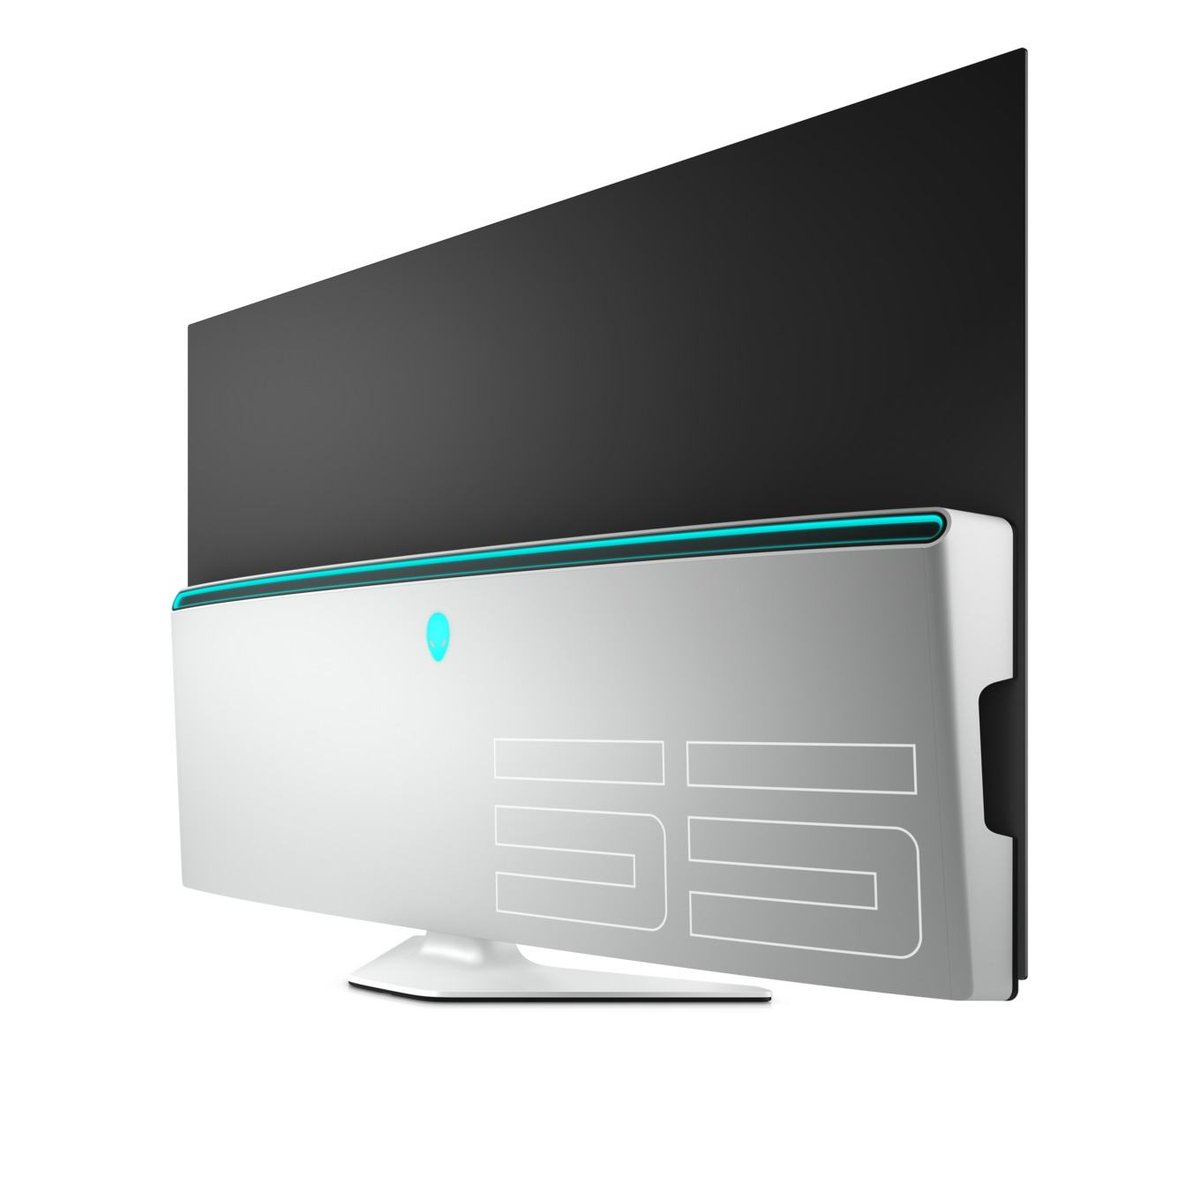 download применение по cst microwave studio для расчёта антенн и